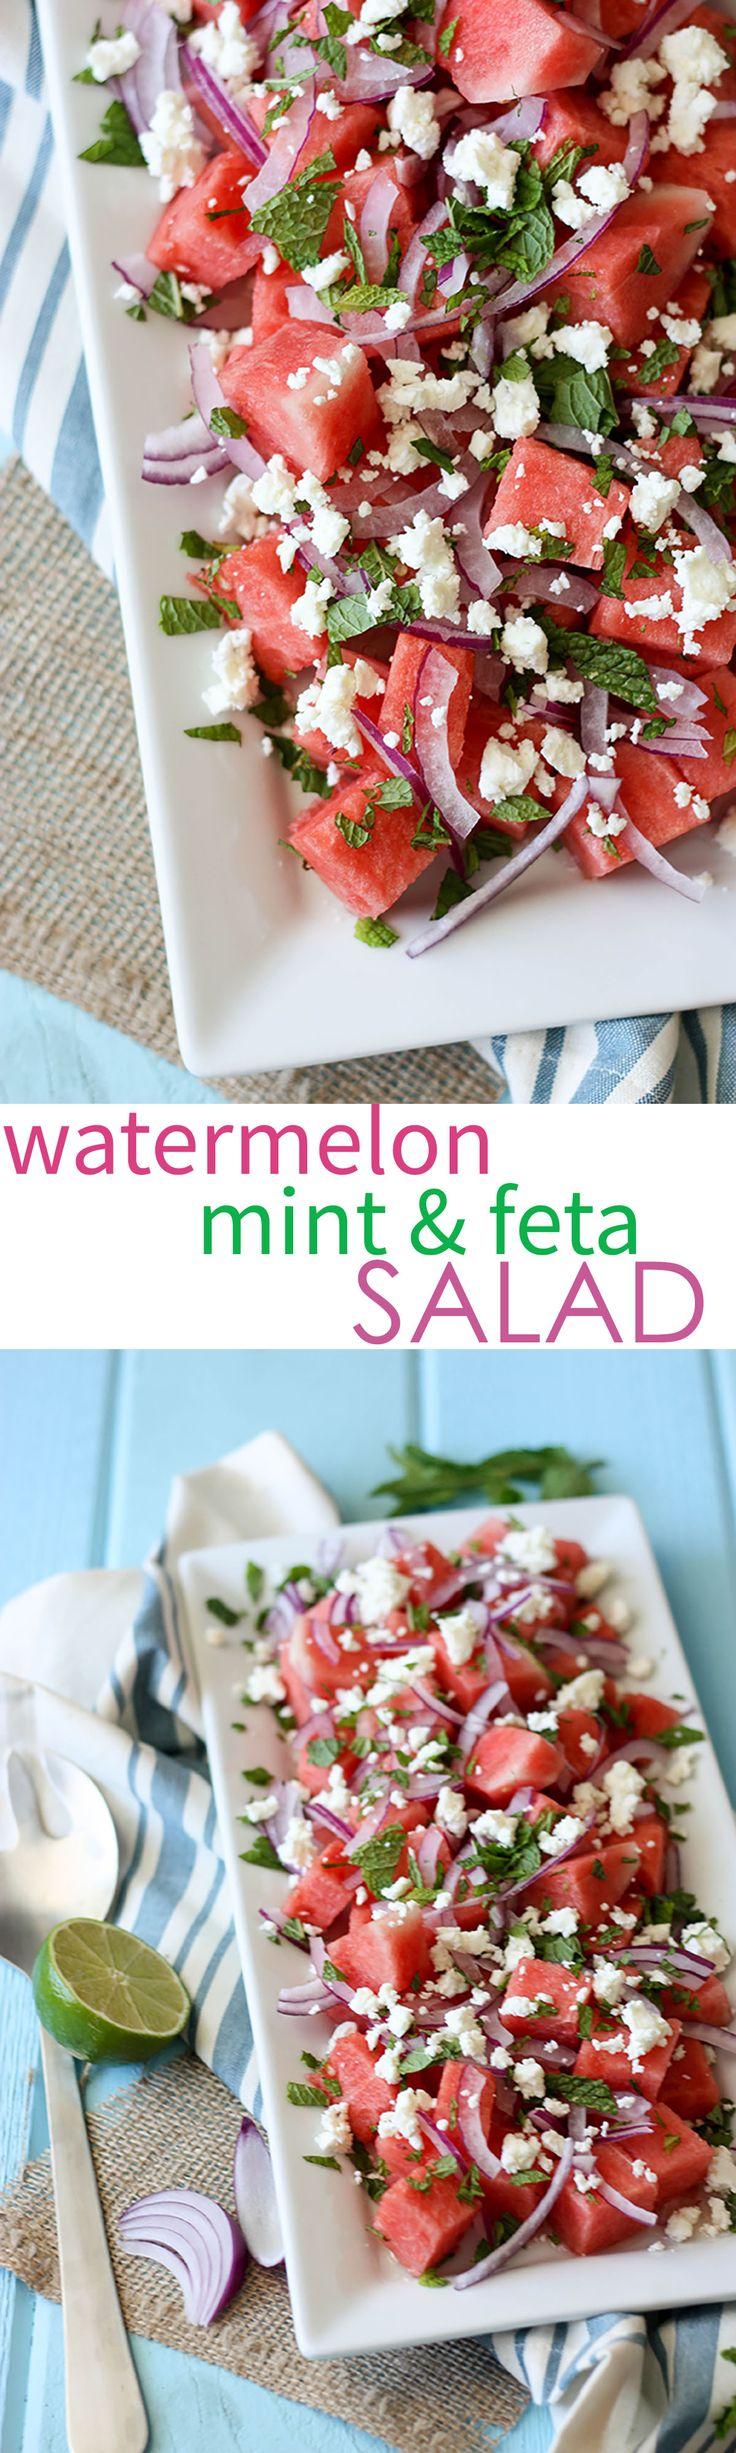 Watermelon Mint Feta Salad www.thehomecookskitchen.com a salad your guests will love